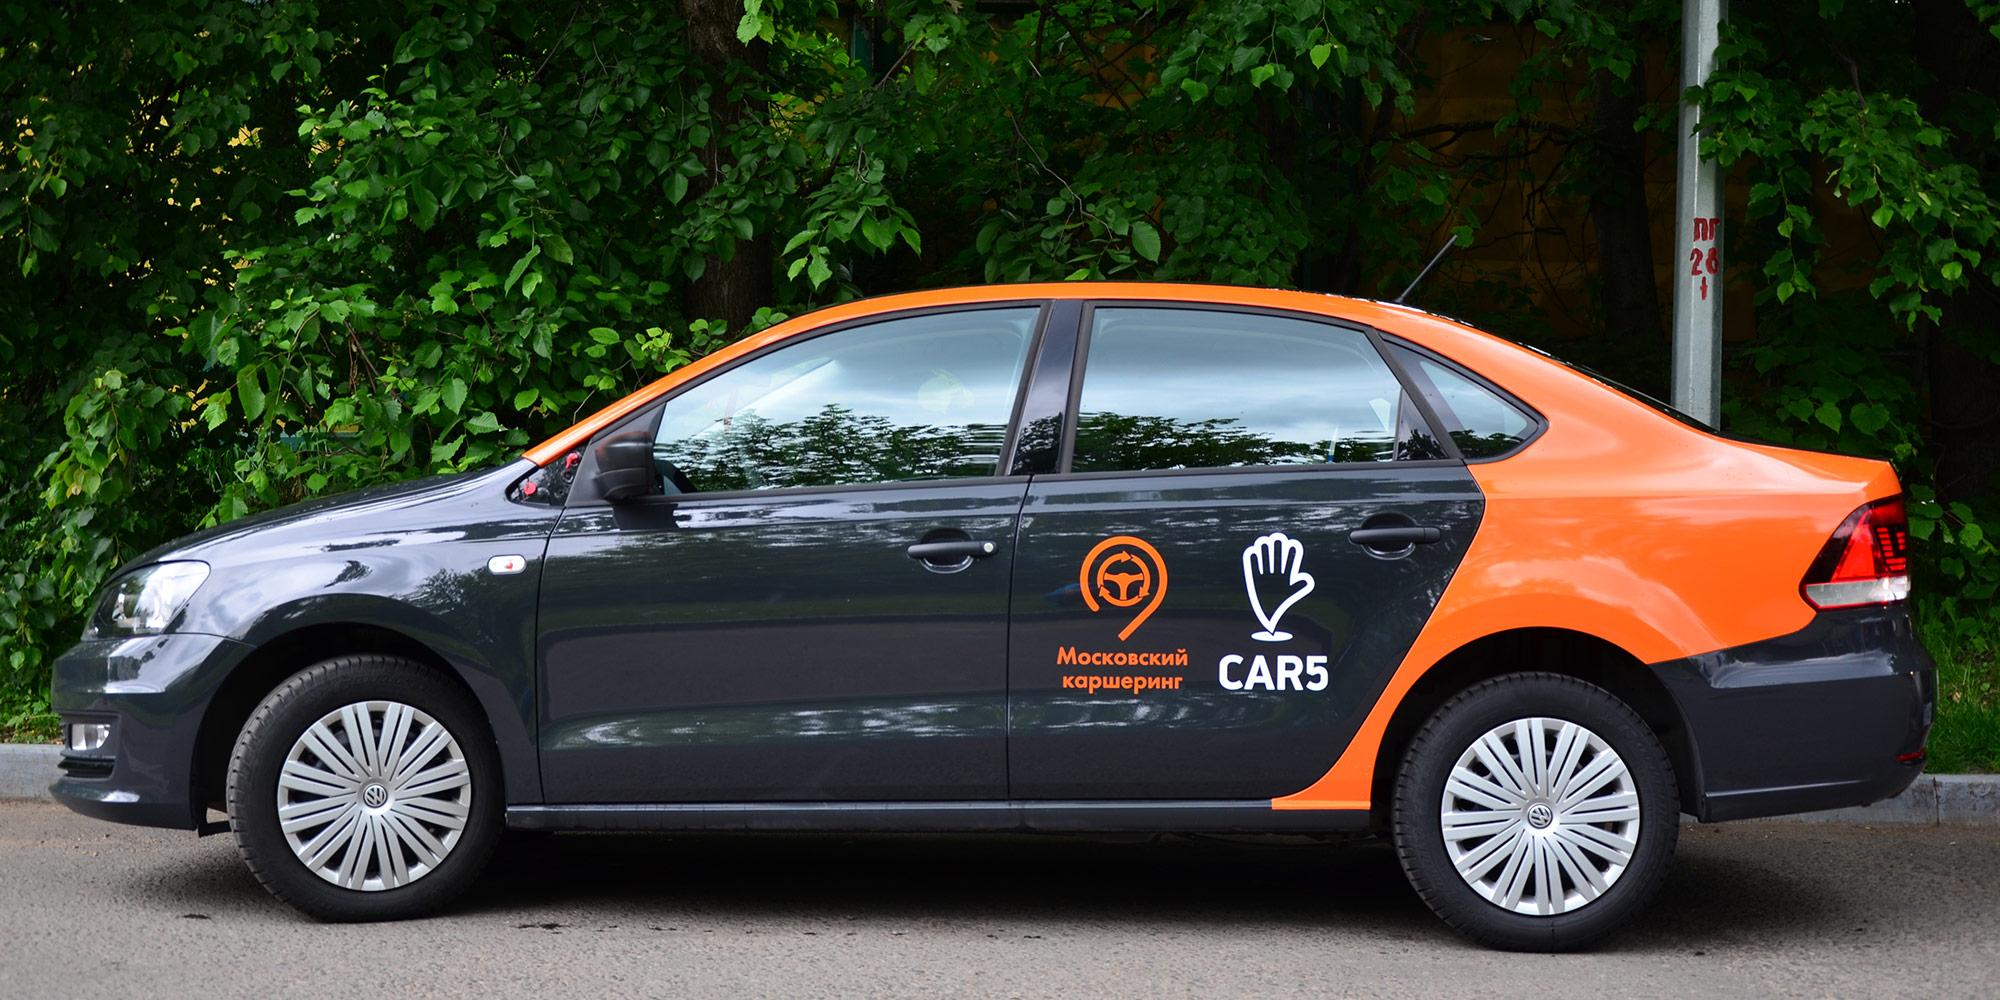 Каршеринг CAR5